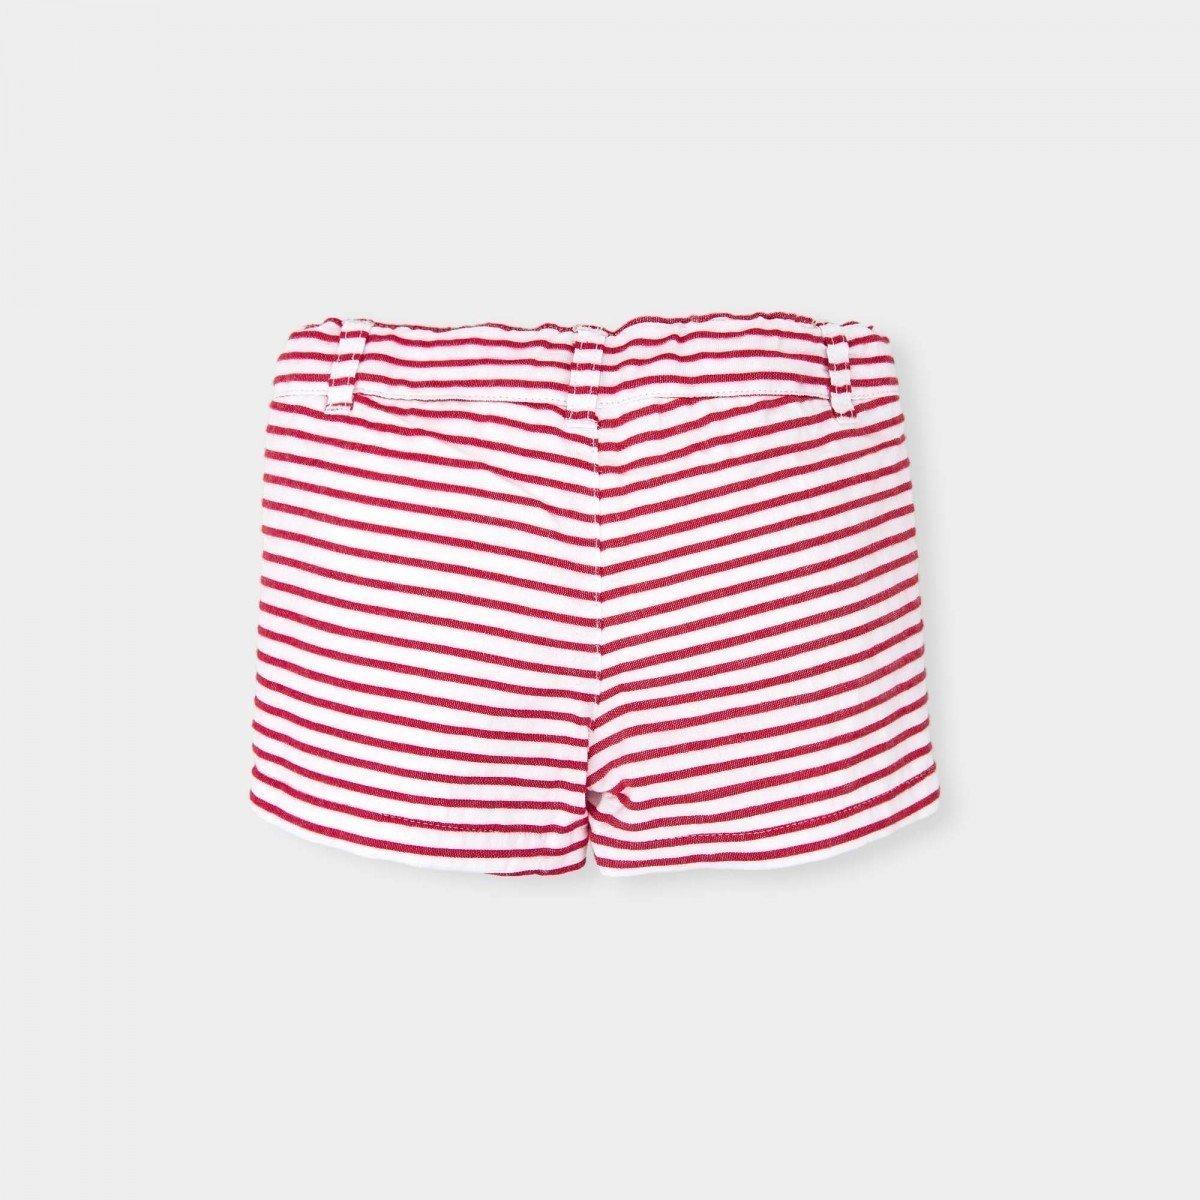 short-plissè-rood-wit-gestreept